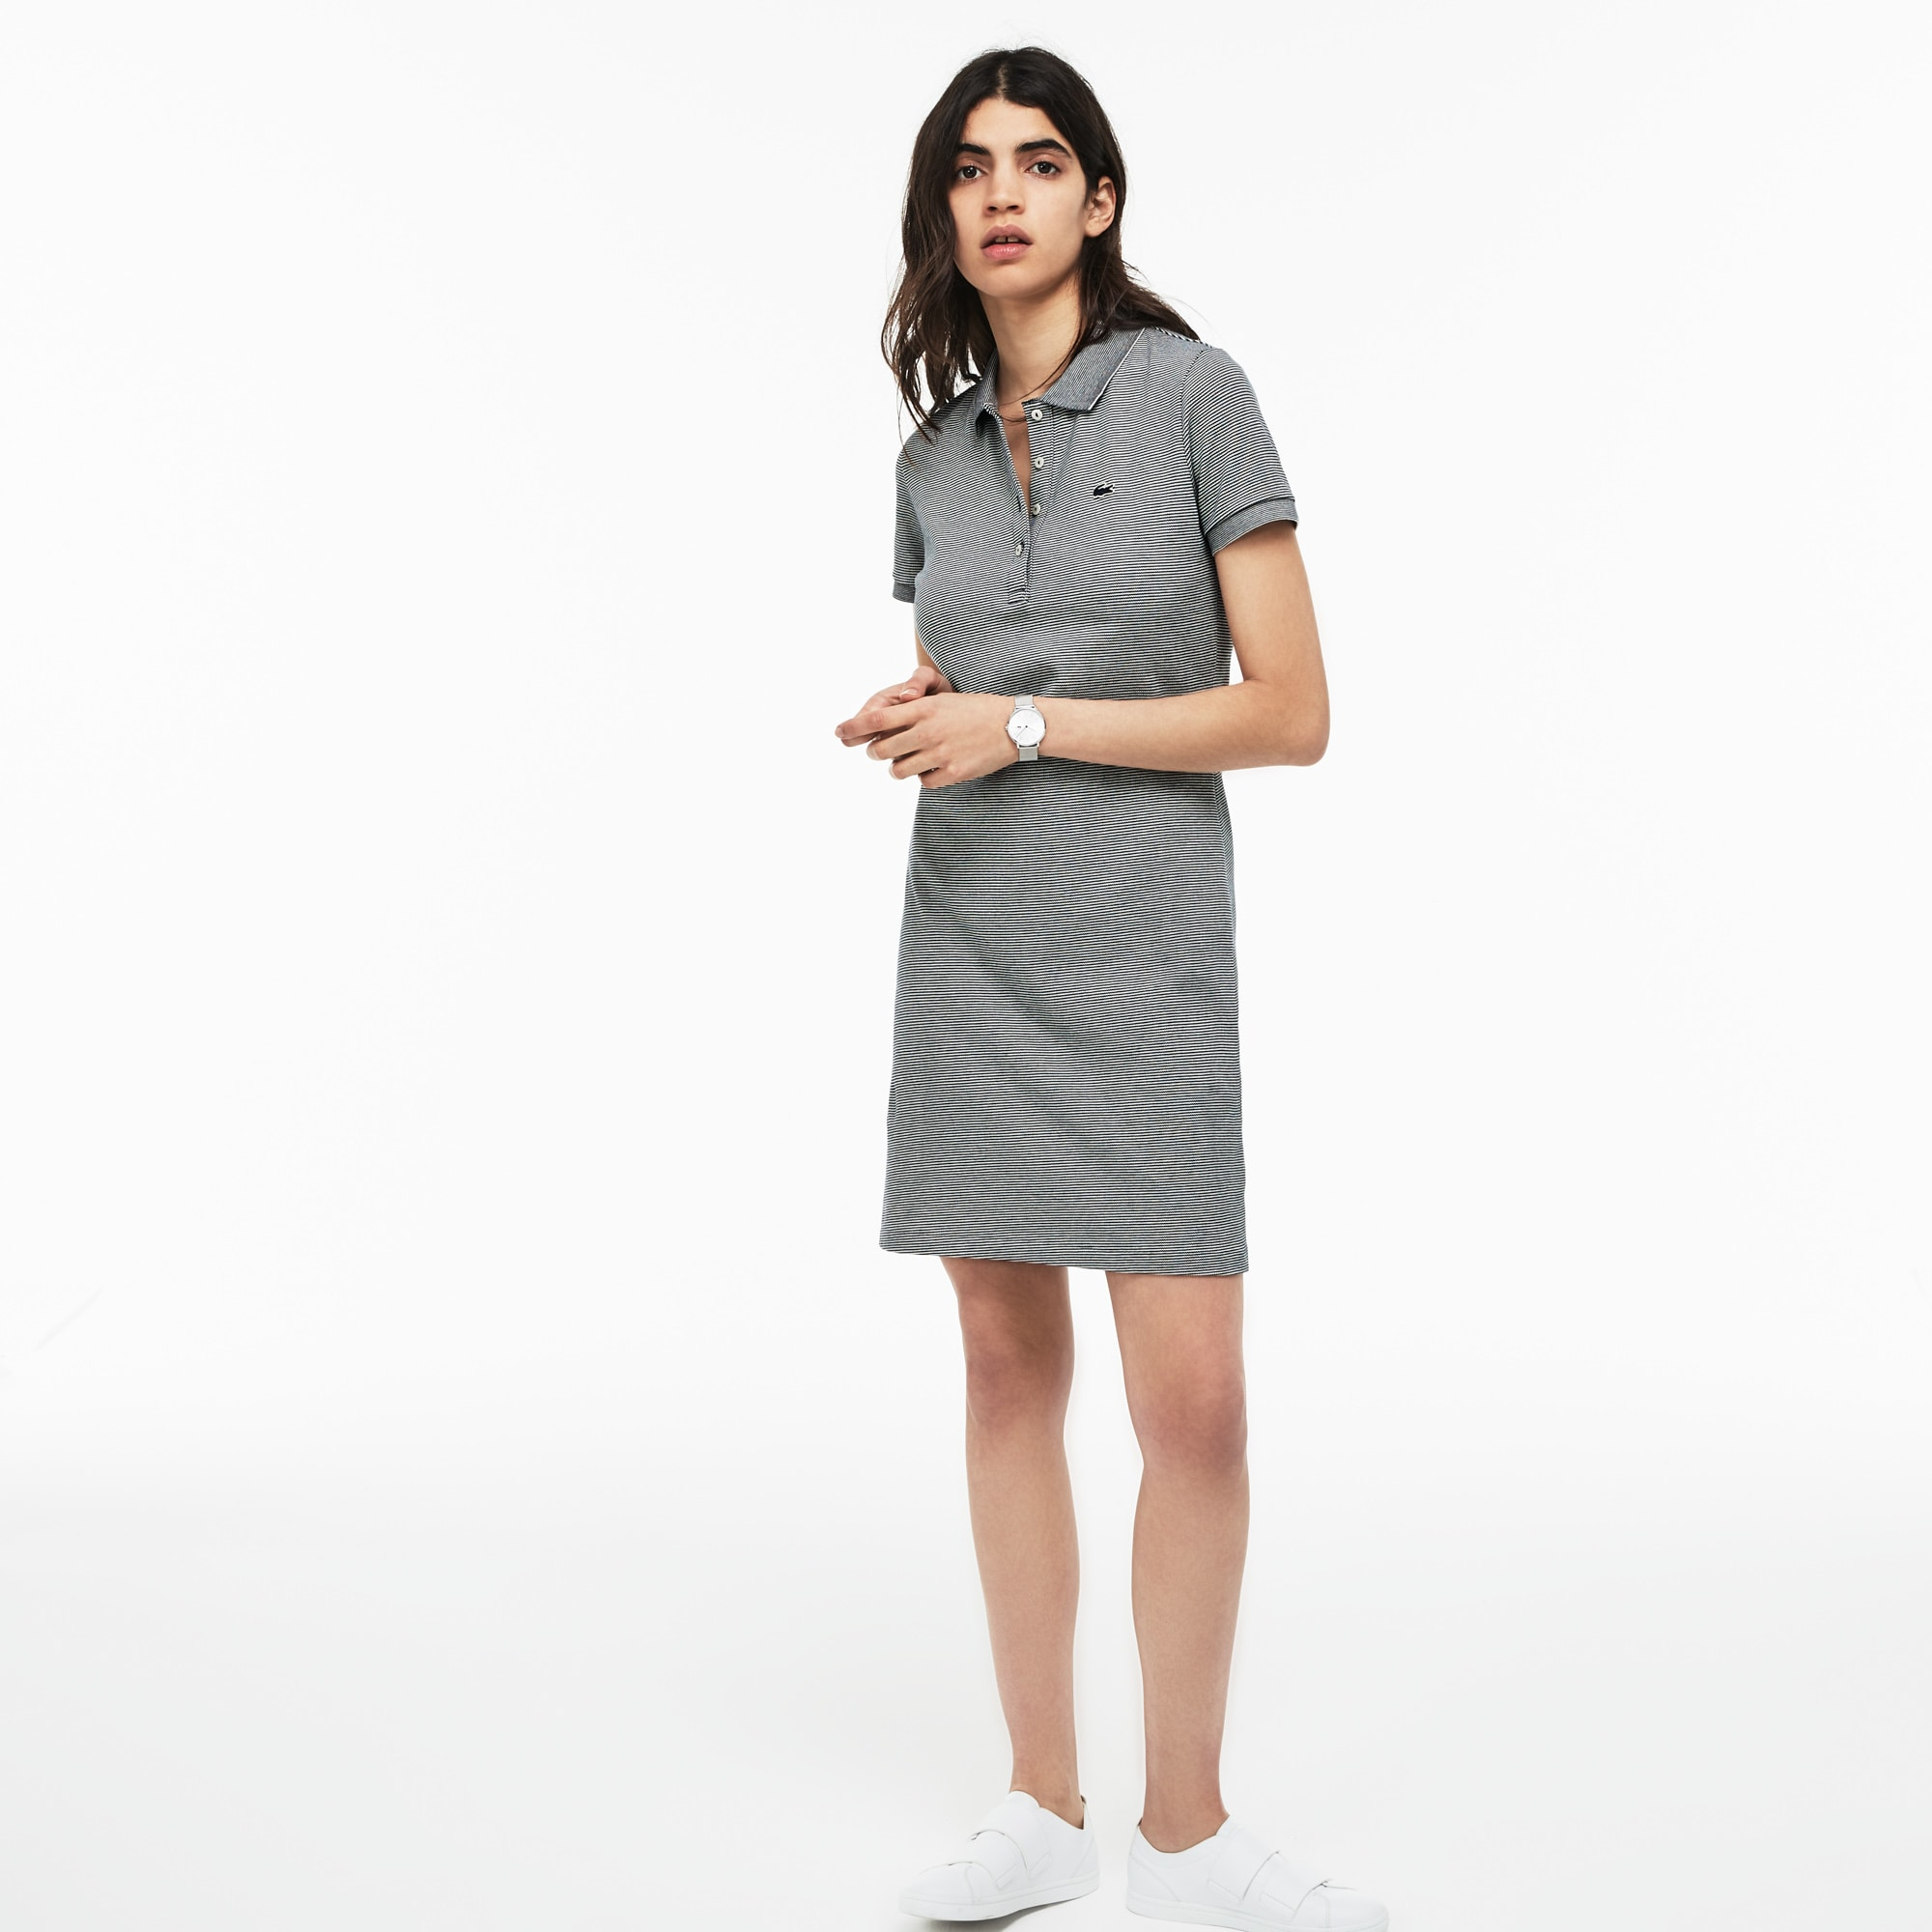 586be63db4 WOMEN'S SLIM FIT PINSTRIPED STRETCH MINI PIQUÉ POLO DRESS